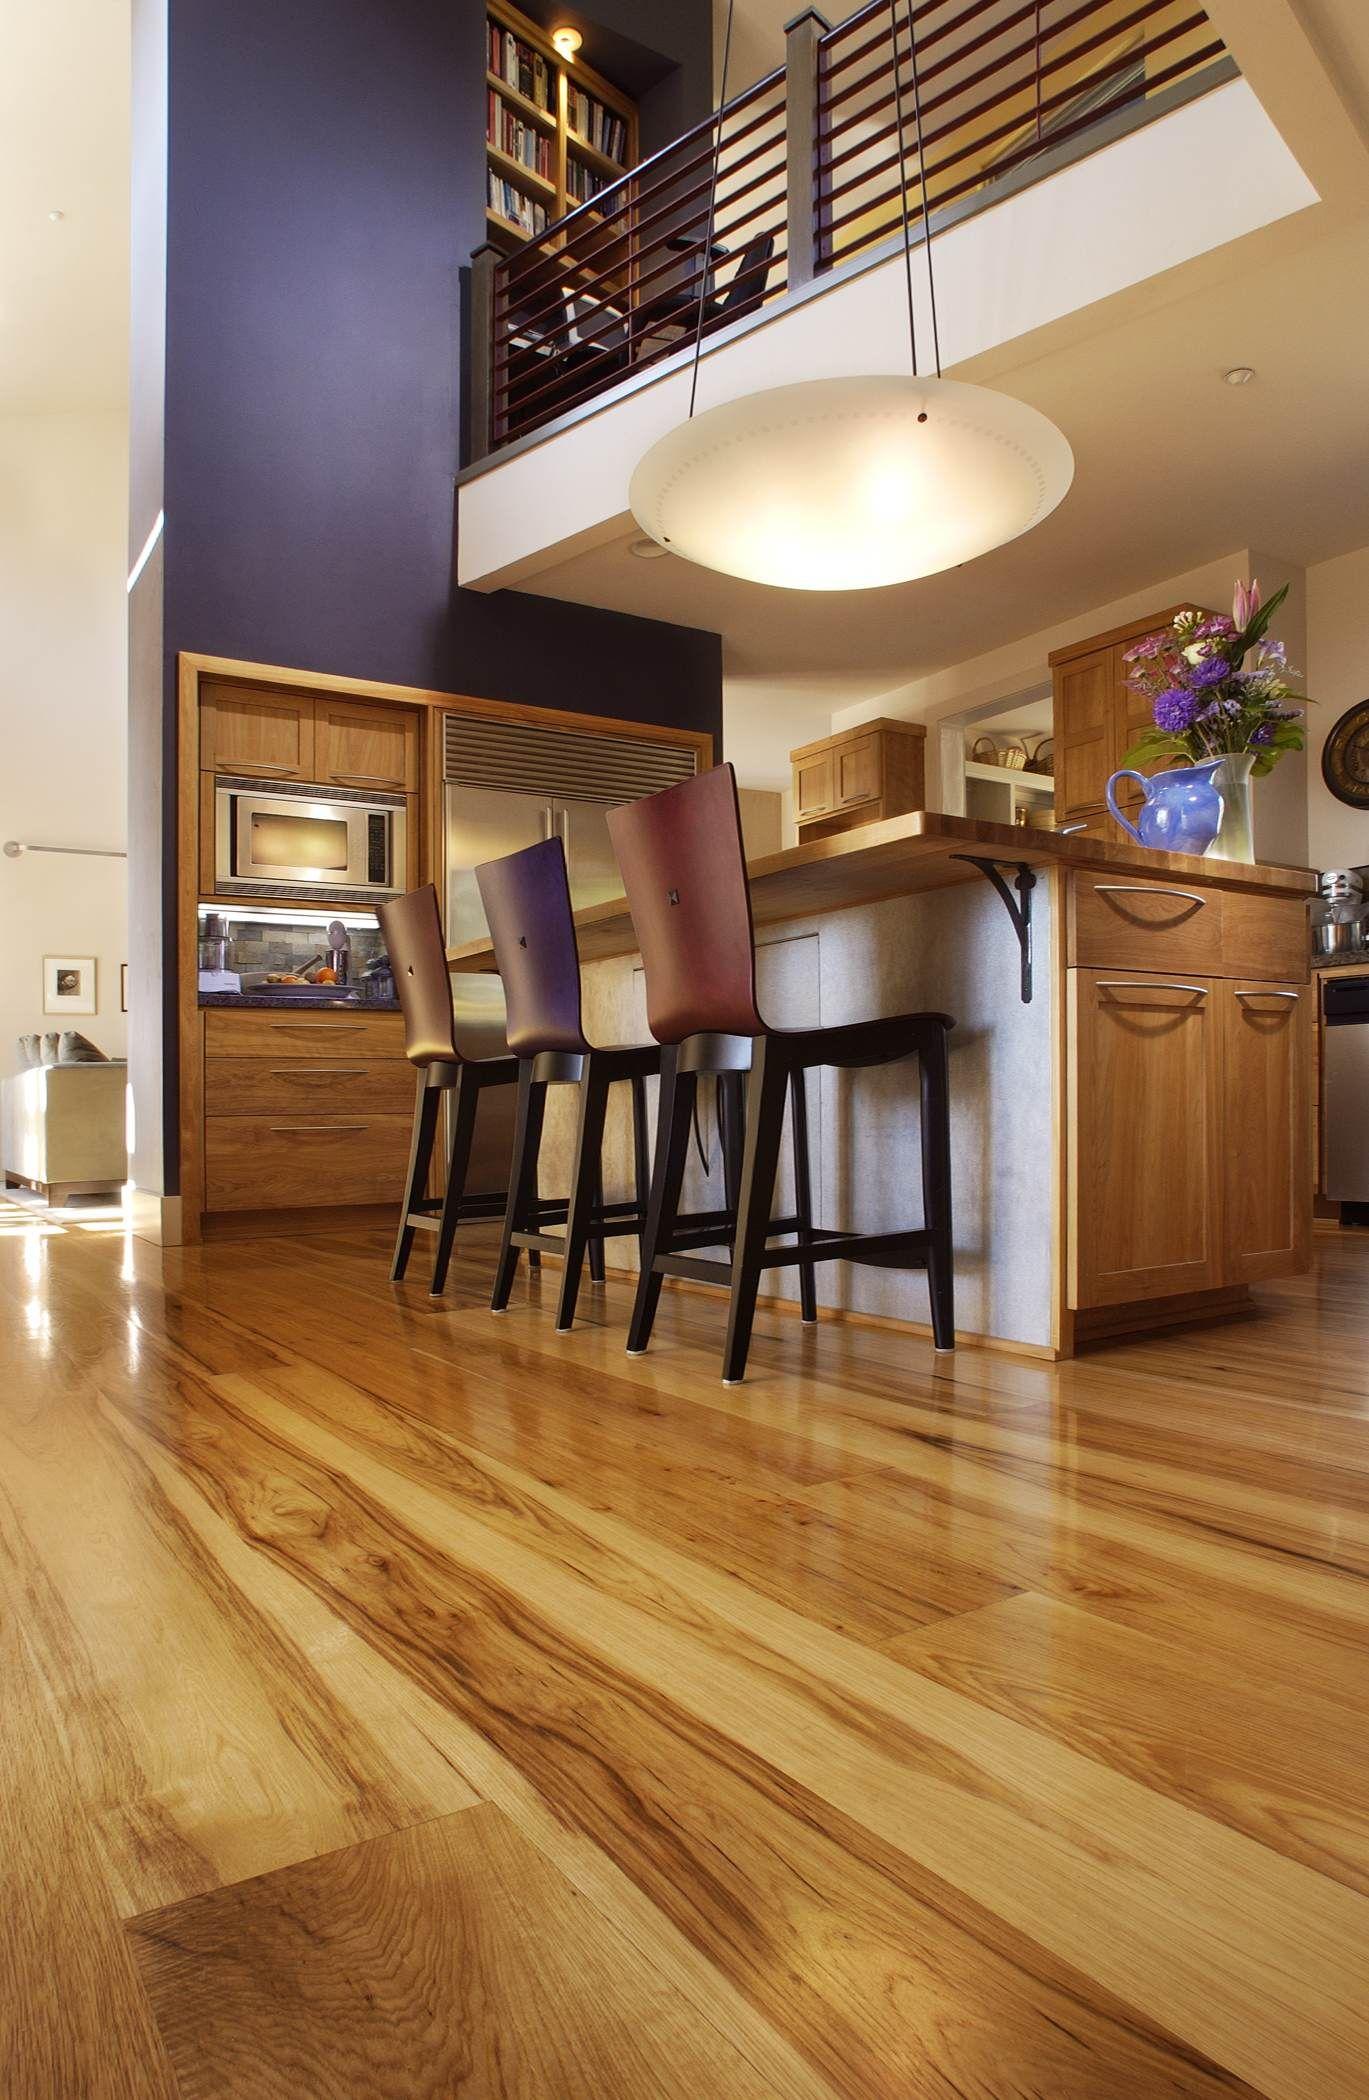 Park Art|My WordPress Blog_Wide Plank Solid Hickory Flooring